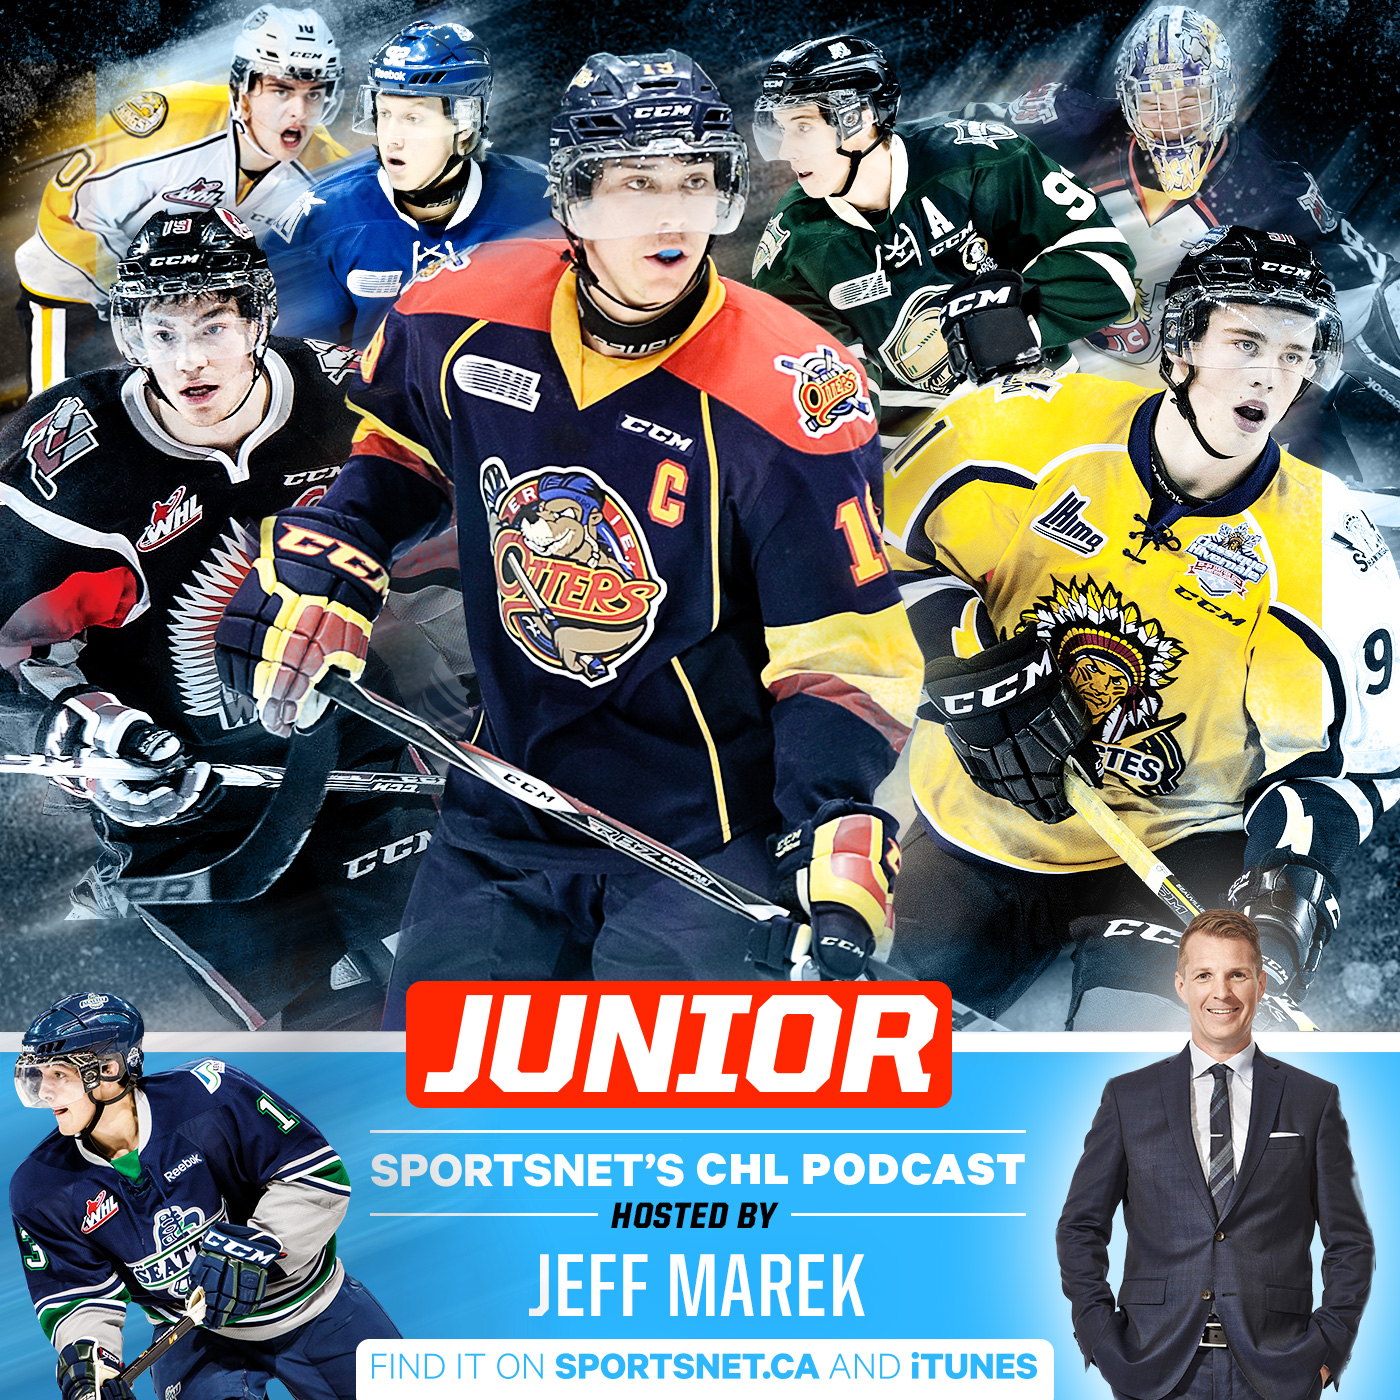 Junior, Sportsnet's CHL podcast